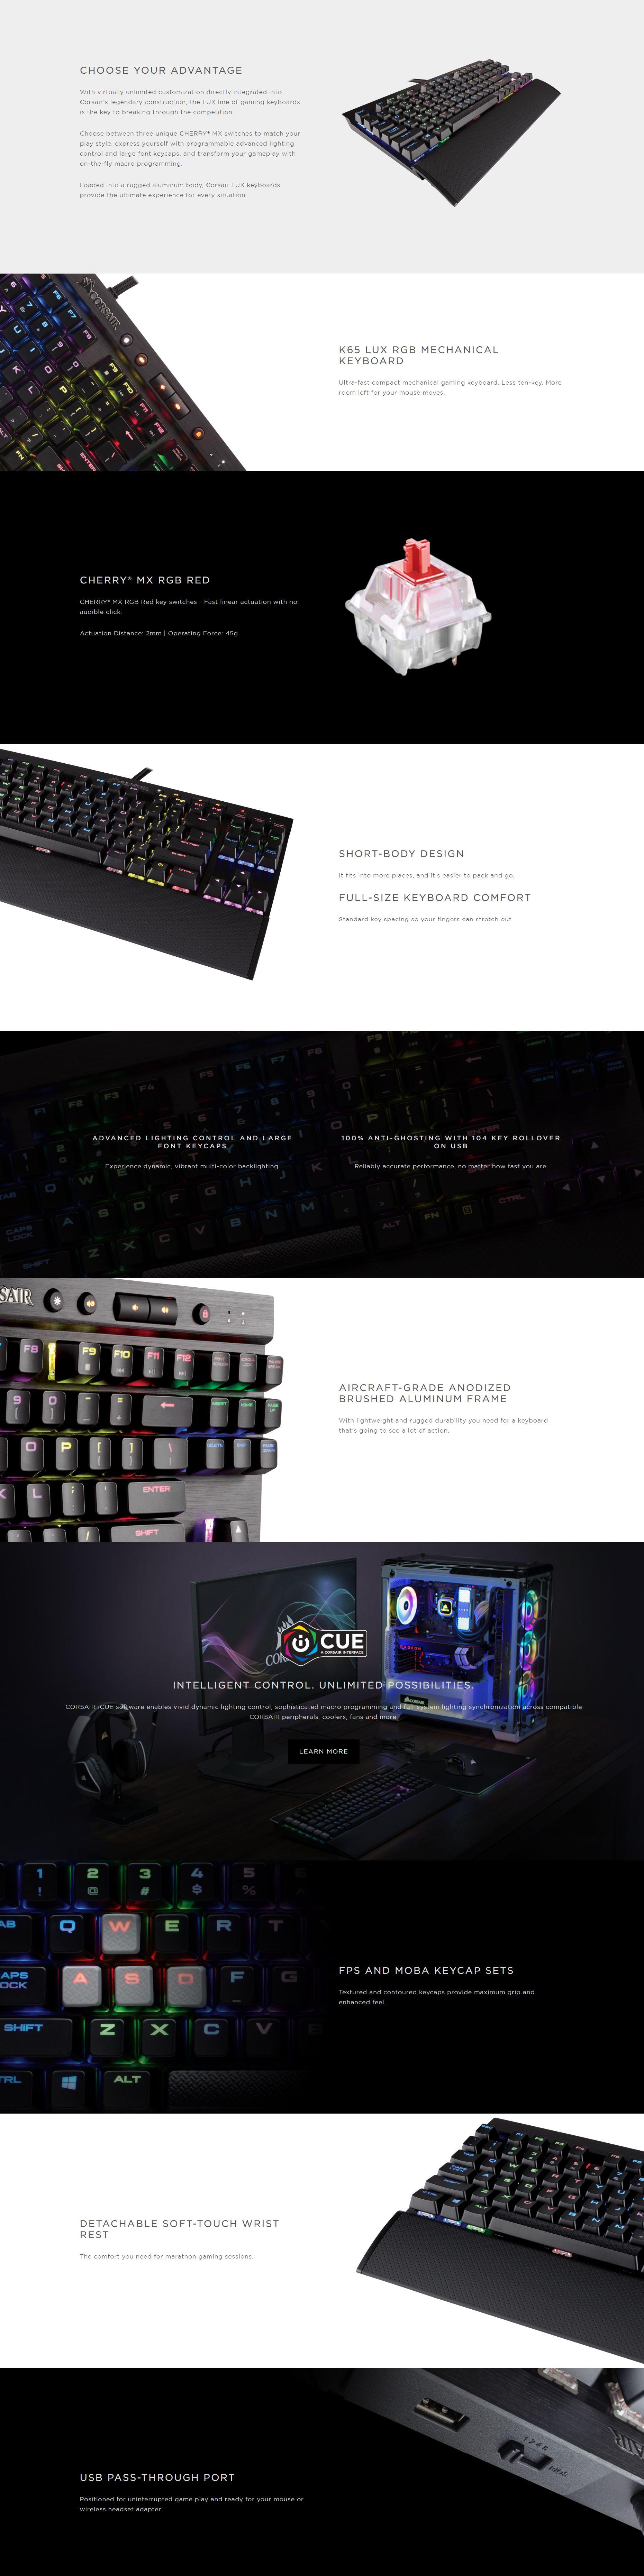 Corsair Gaming K65 LUX RGB Cherry MX Red